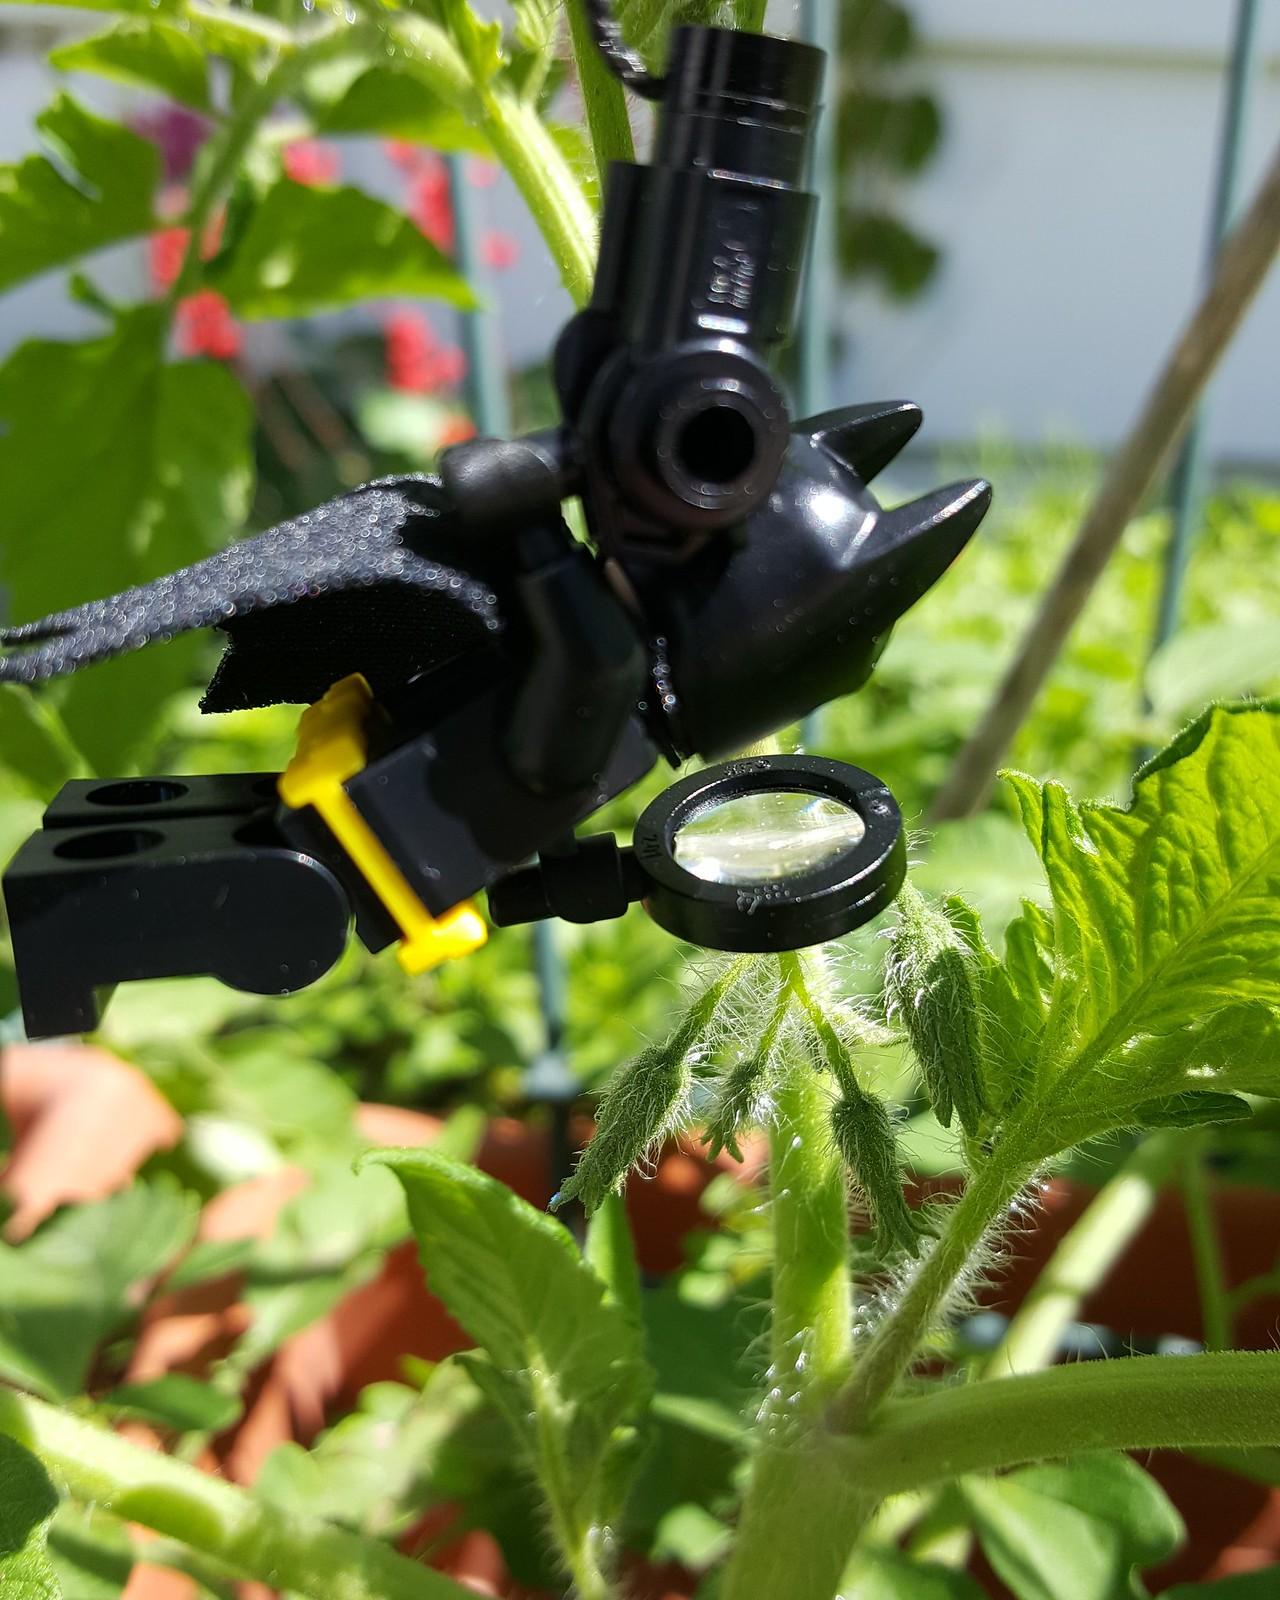 Batman checks the tomato flowers